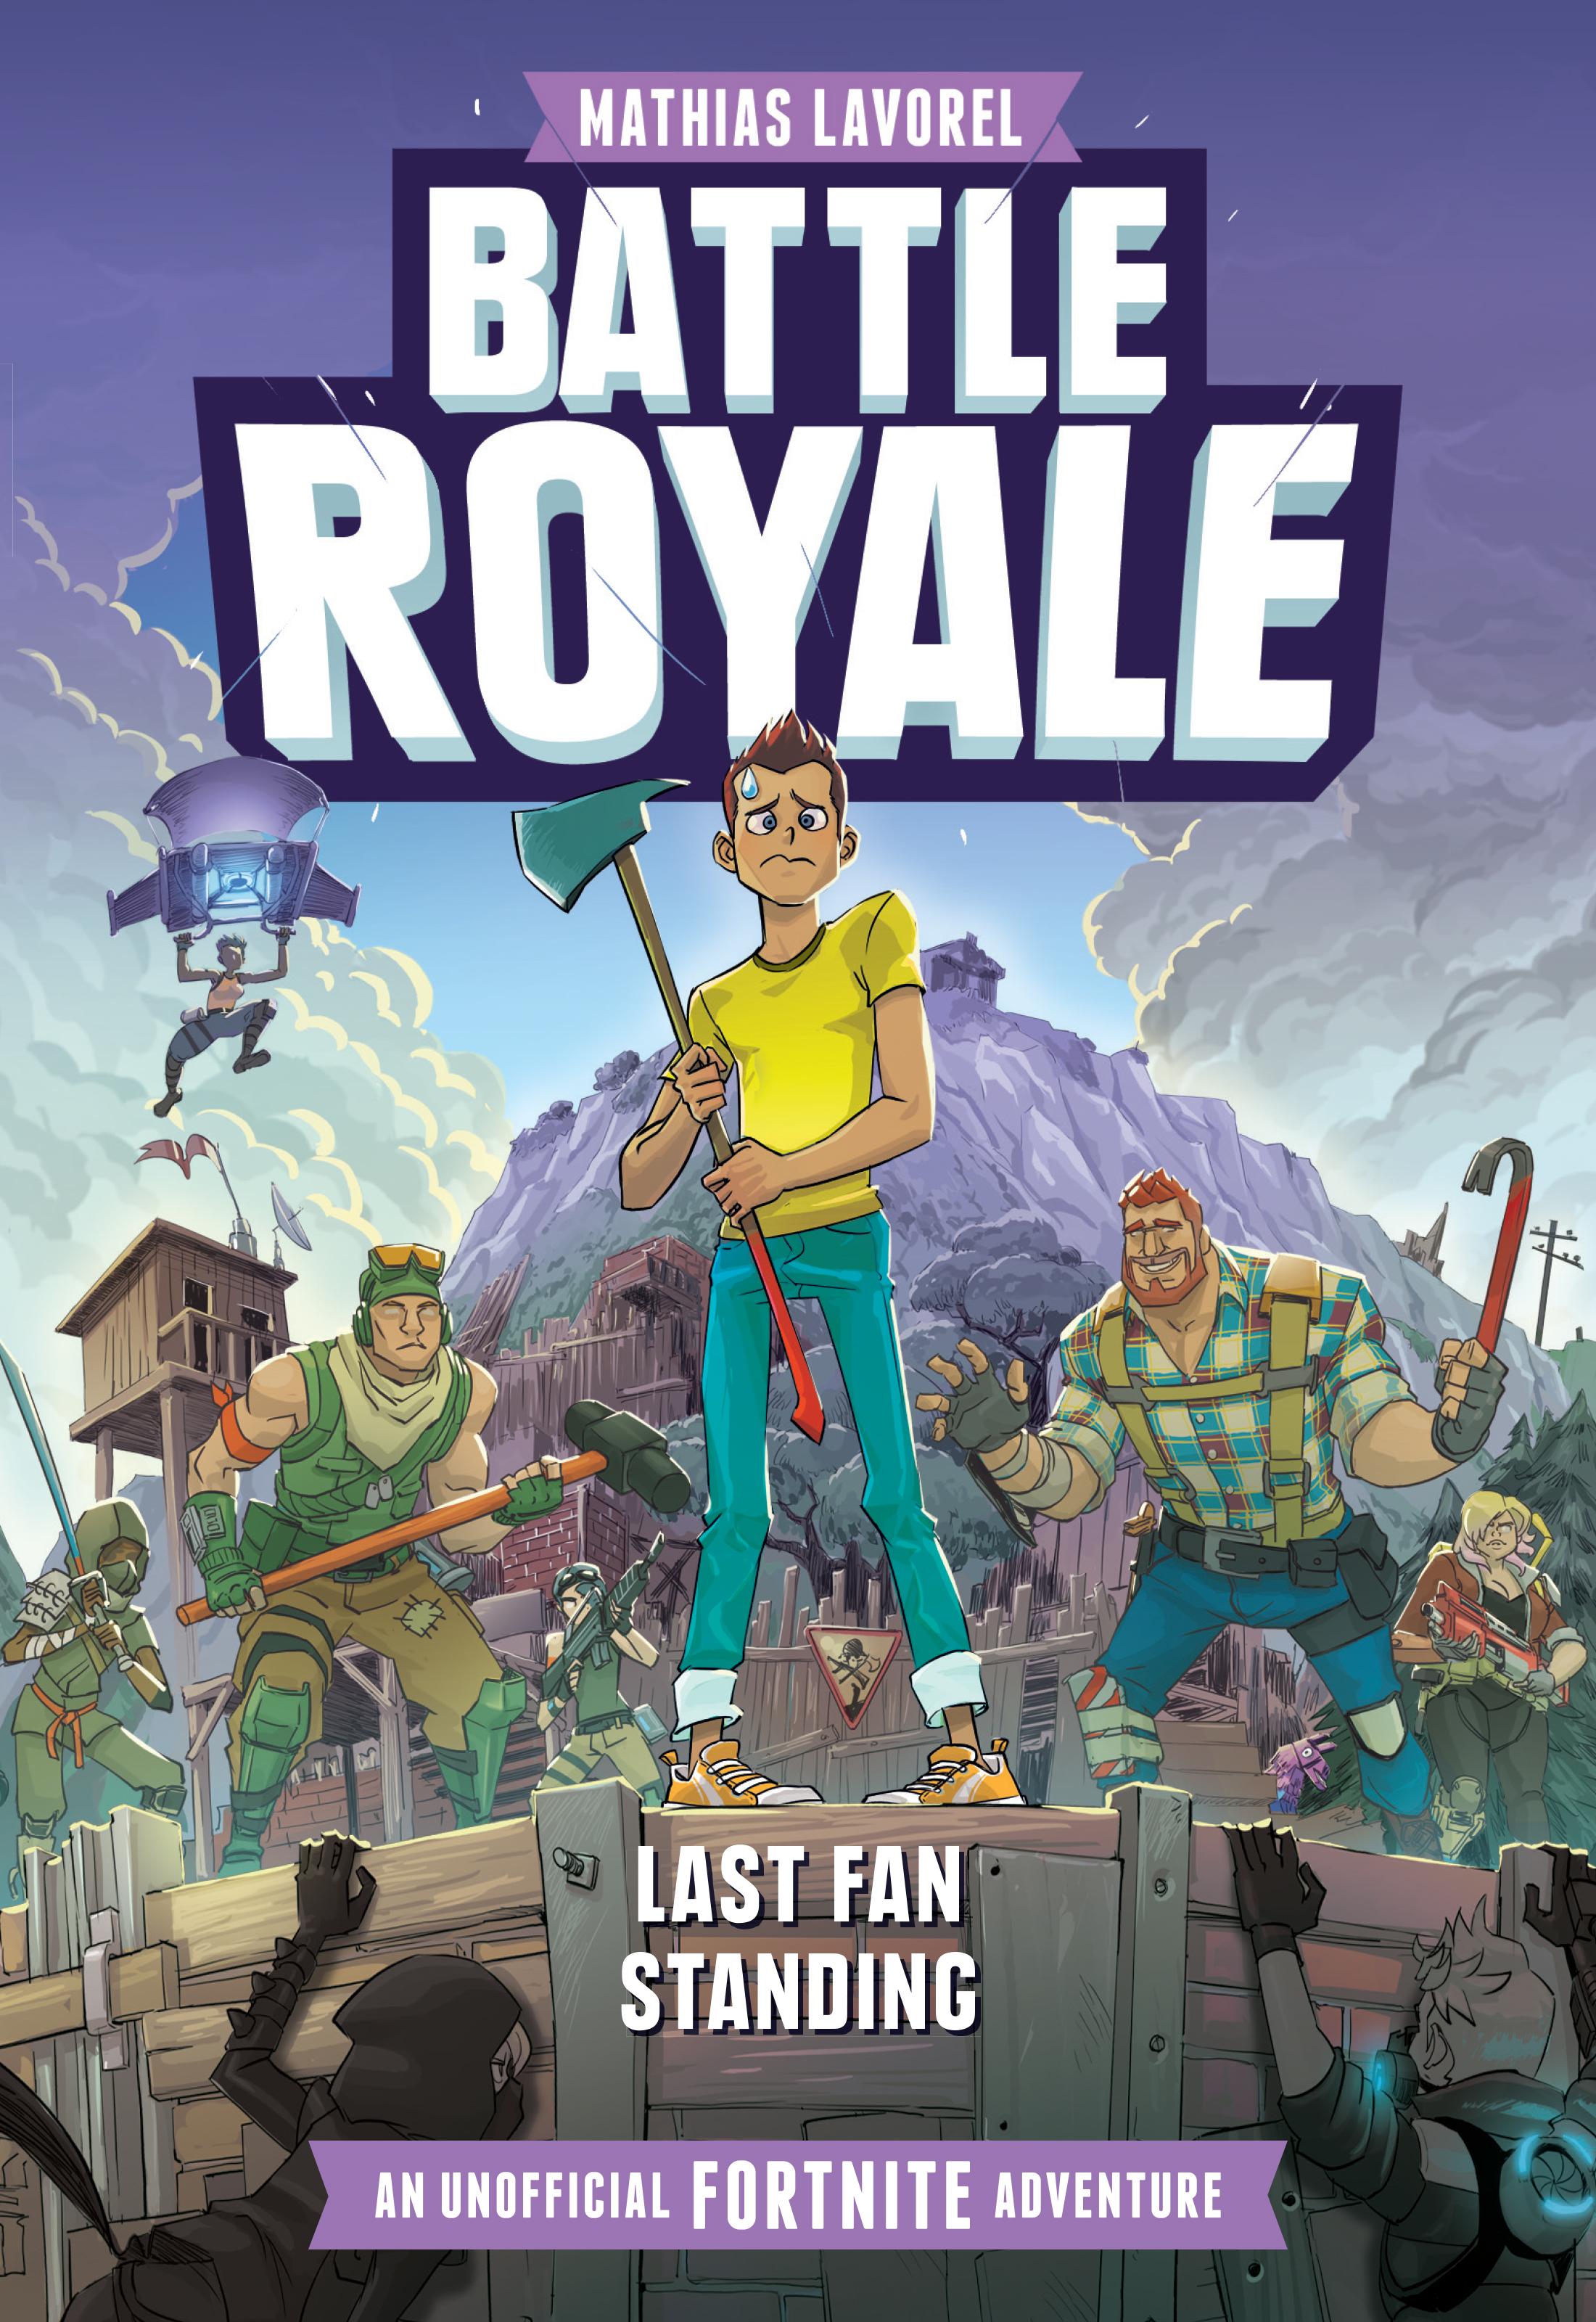 Battle Royale An Unofficial Fortnite Adventure